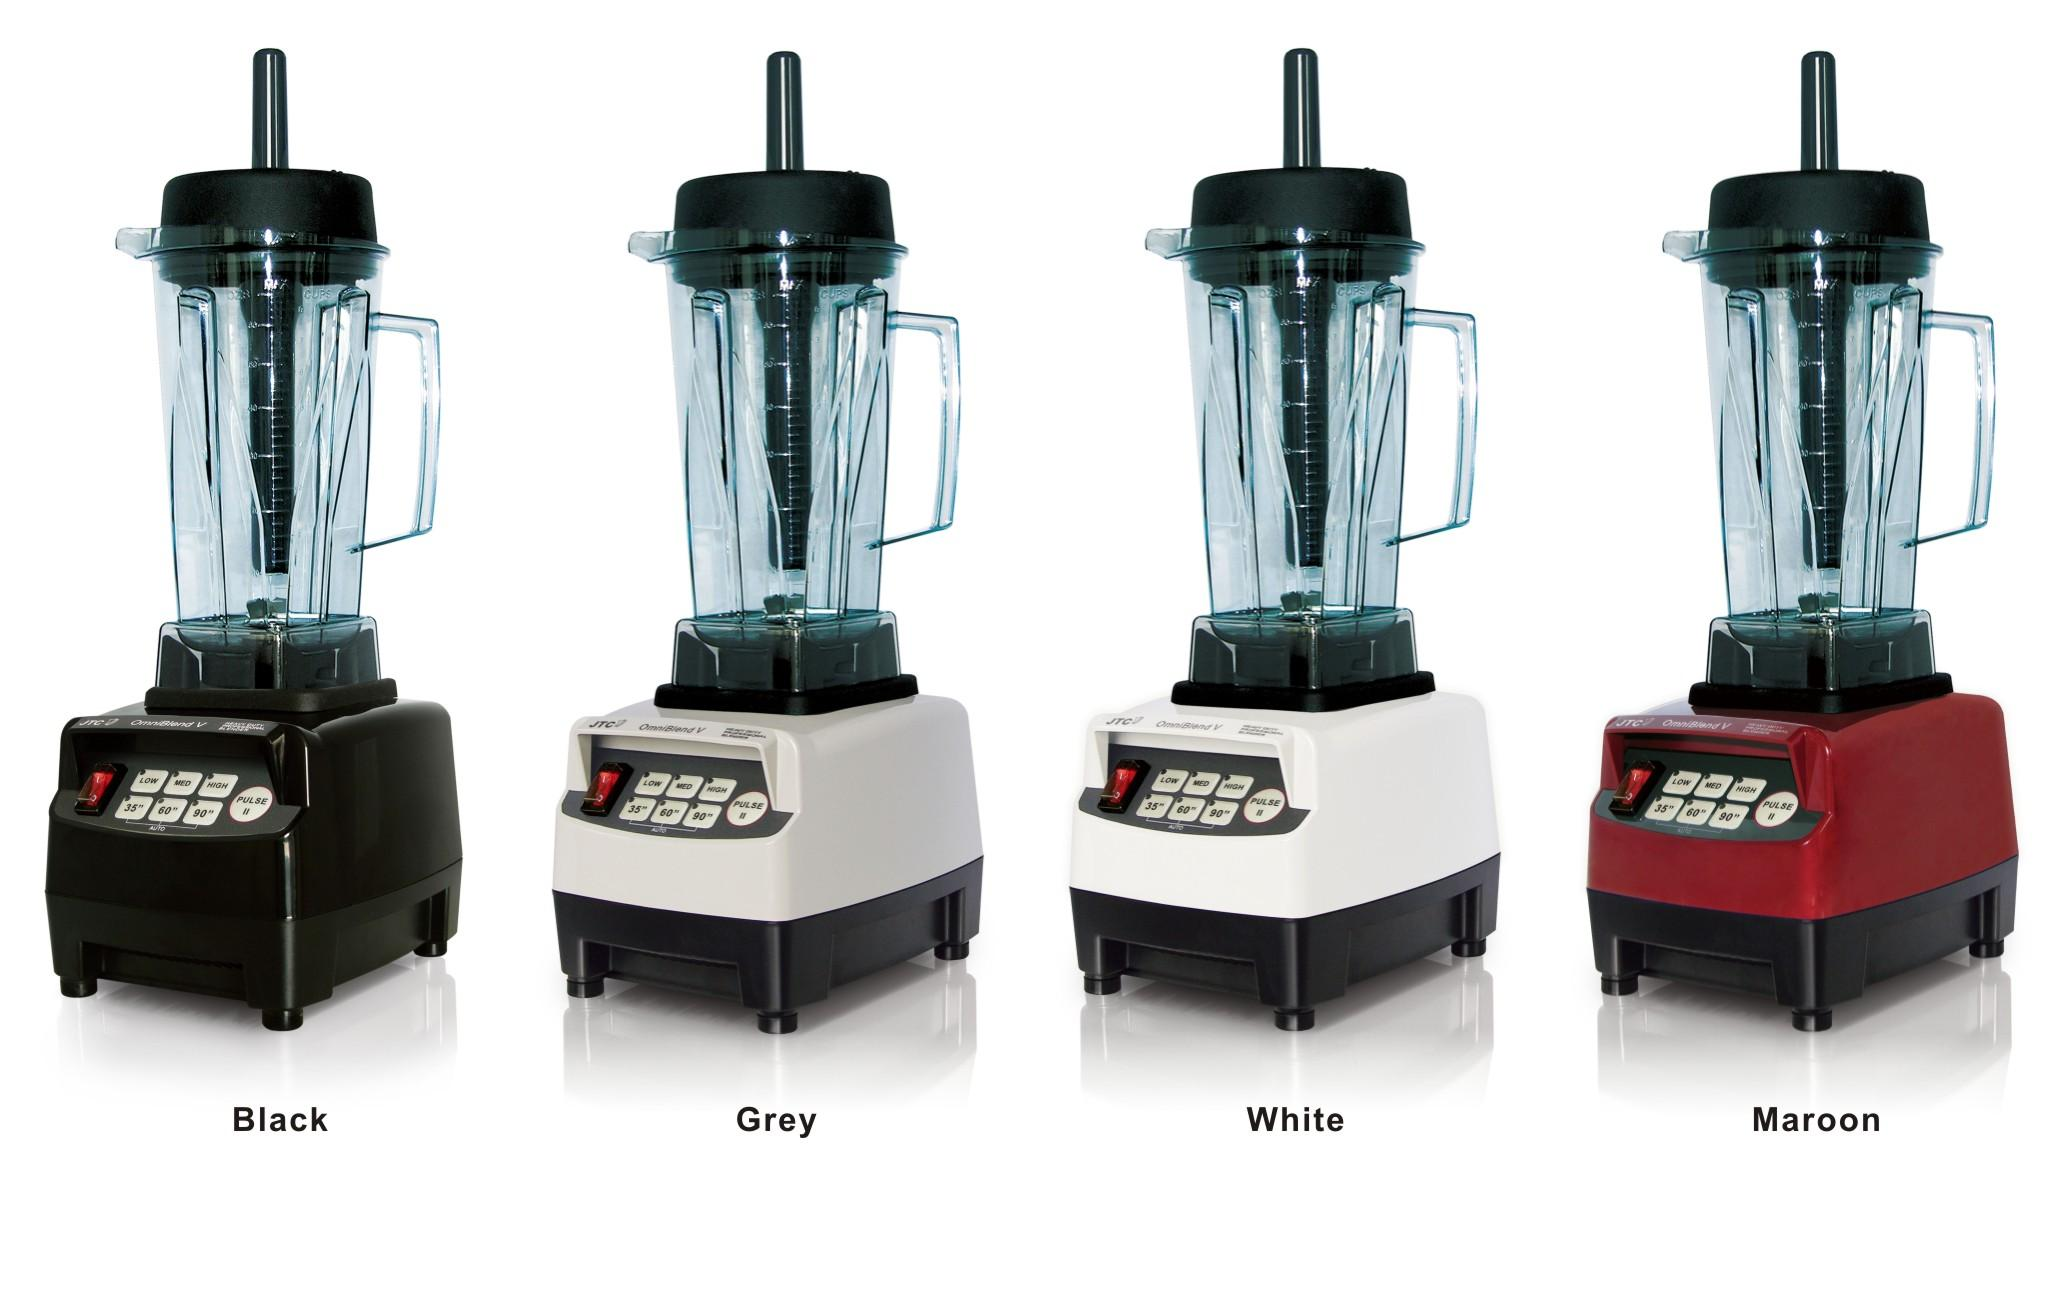 Pc World Kitchen Appliances Online Buy Wholesale Blender Foods From China Blender Foods